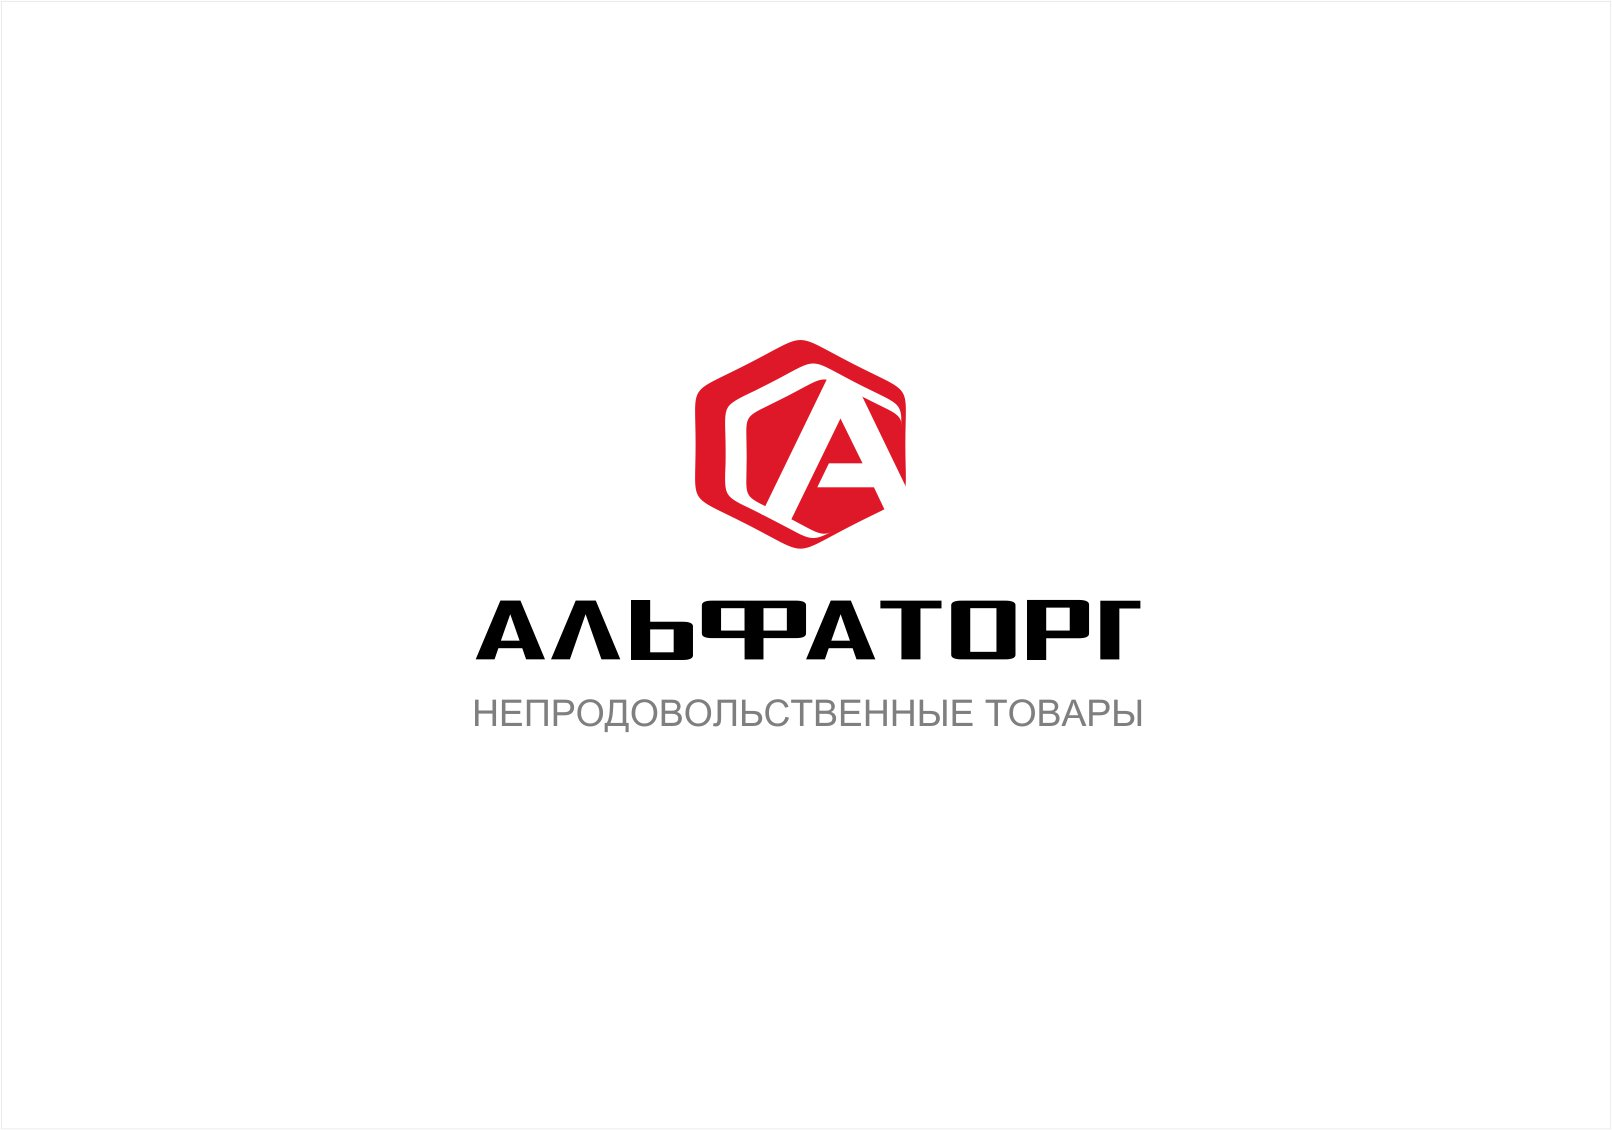 Логотип и фирменный стиль фото f_2505f0b6455ef203.jpg